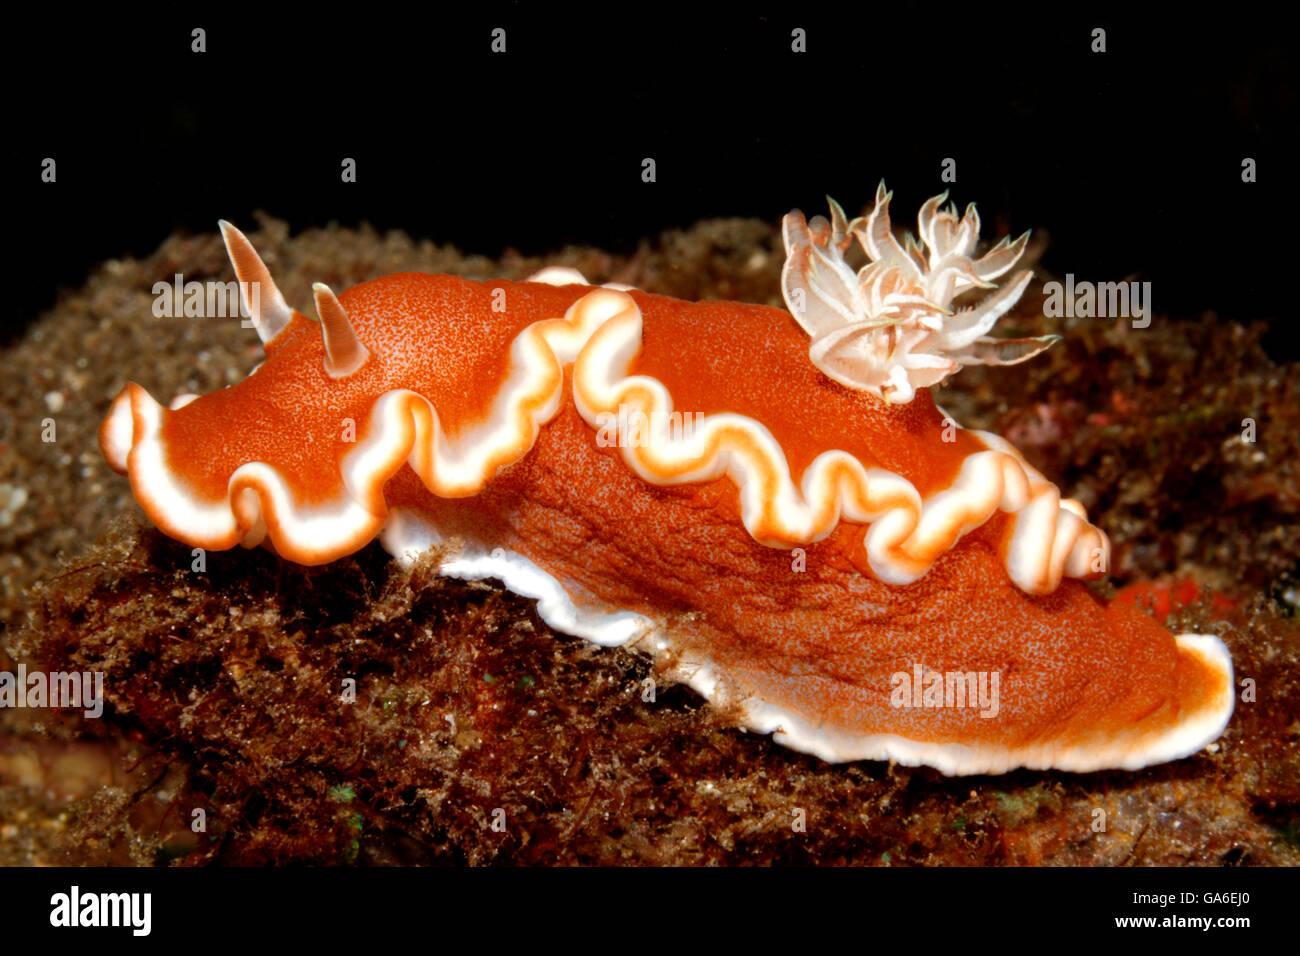 nudibranch-glossodoris-rufomarginata-com